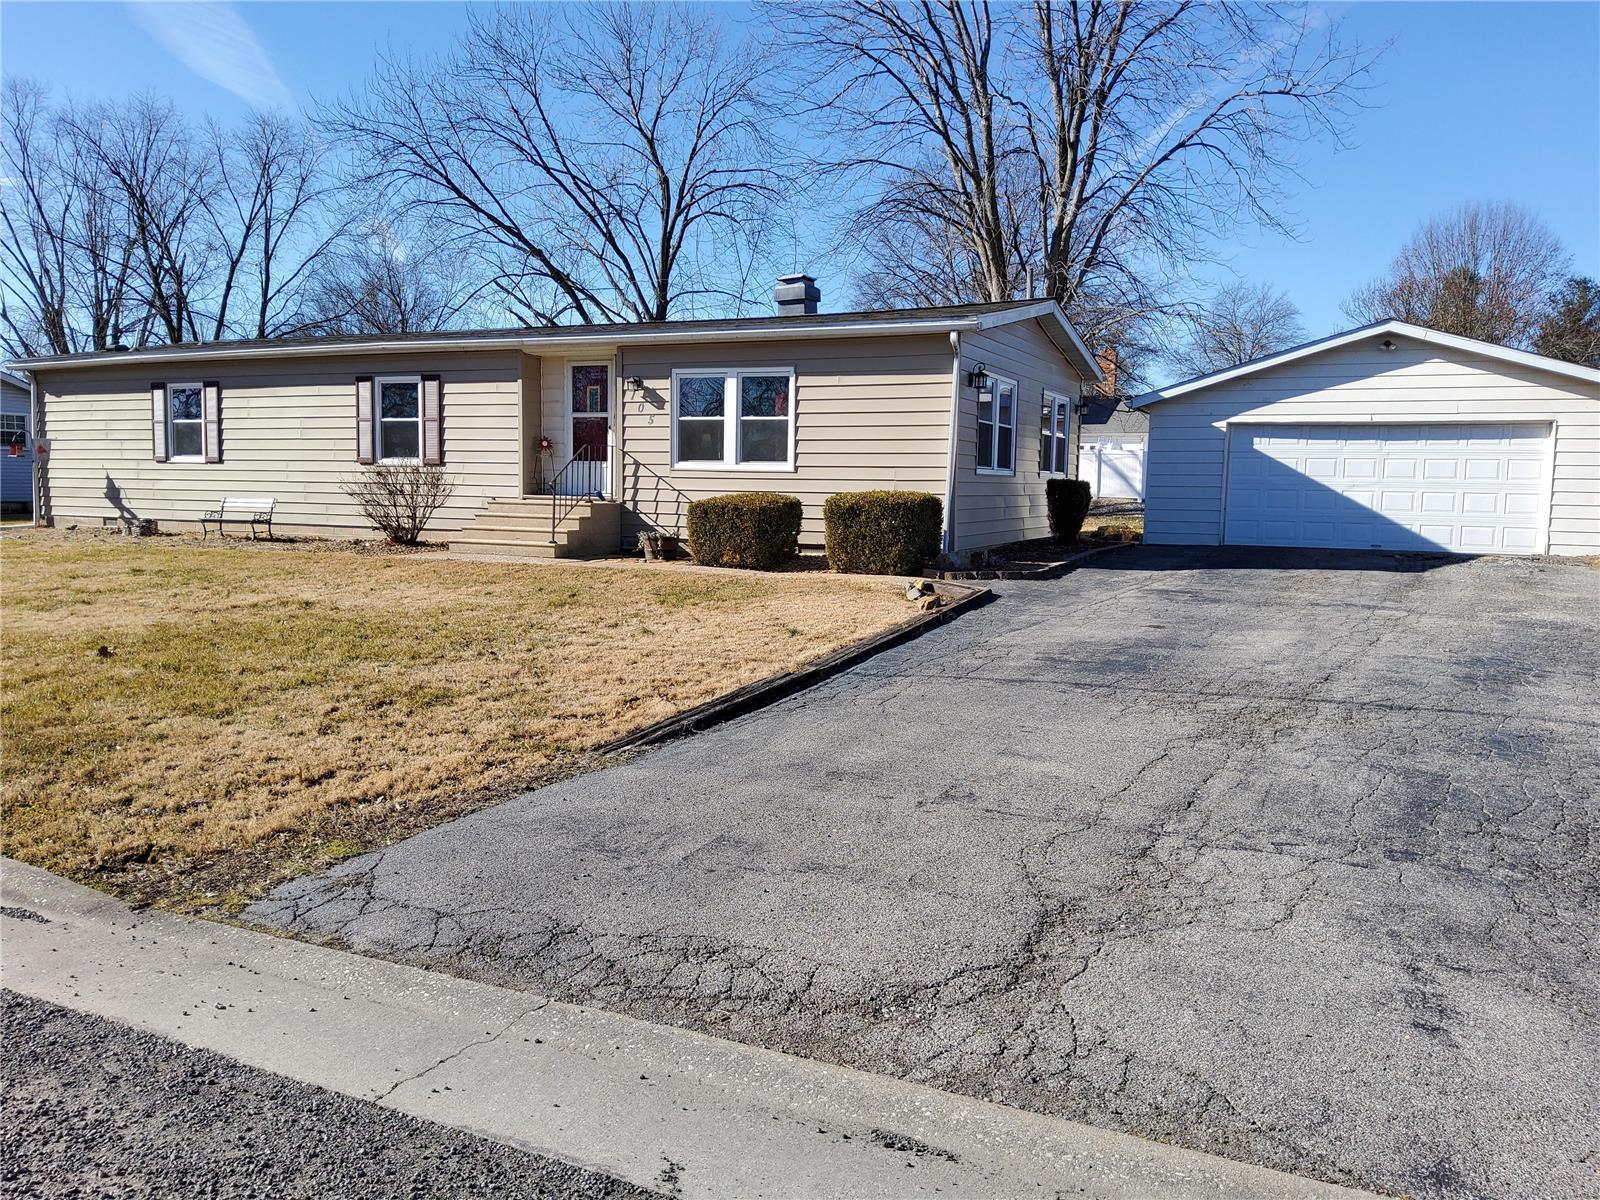 105 N Lincoln Property Photo - Smithton, IL real estate listing